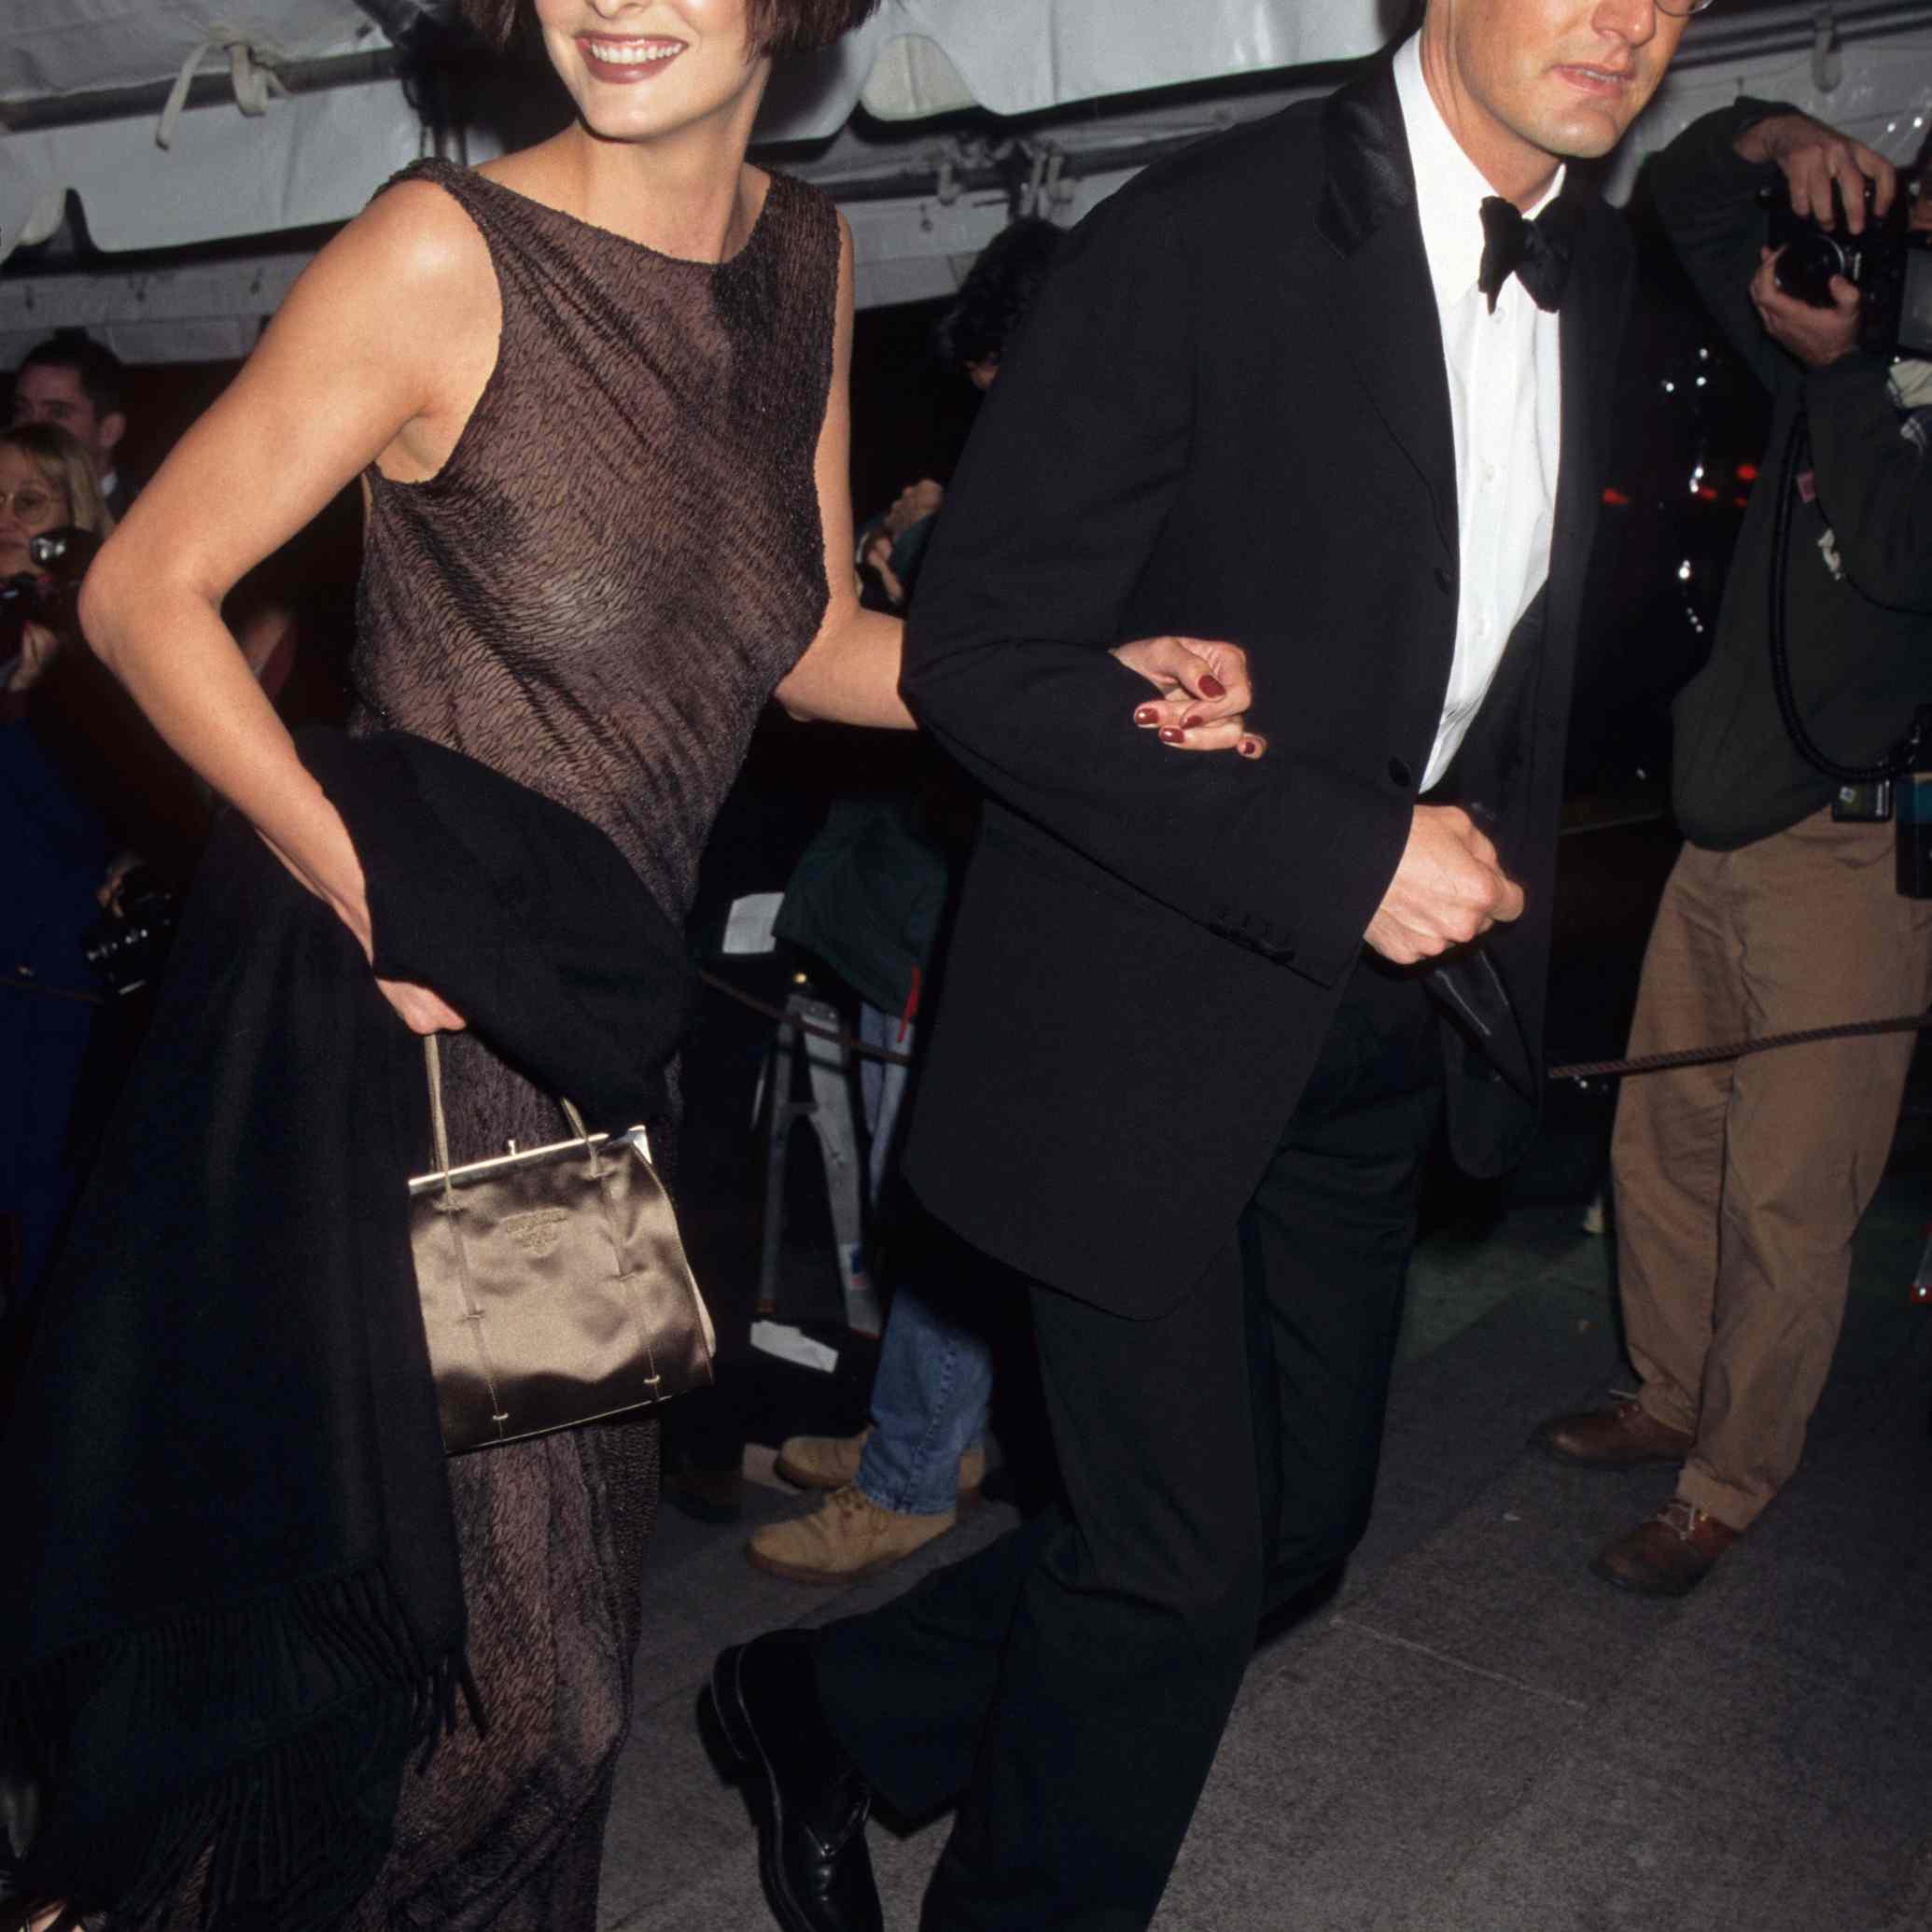 Linda Evangelista and Kyle MacLachlan